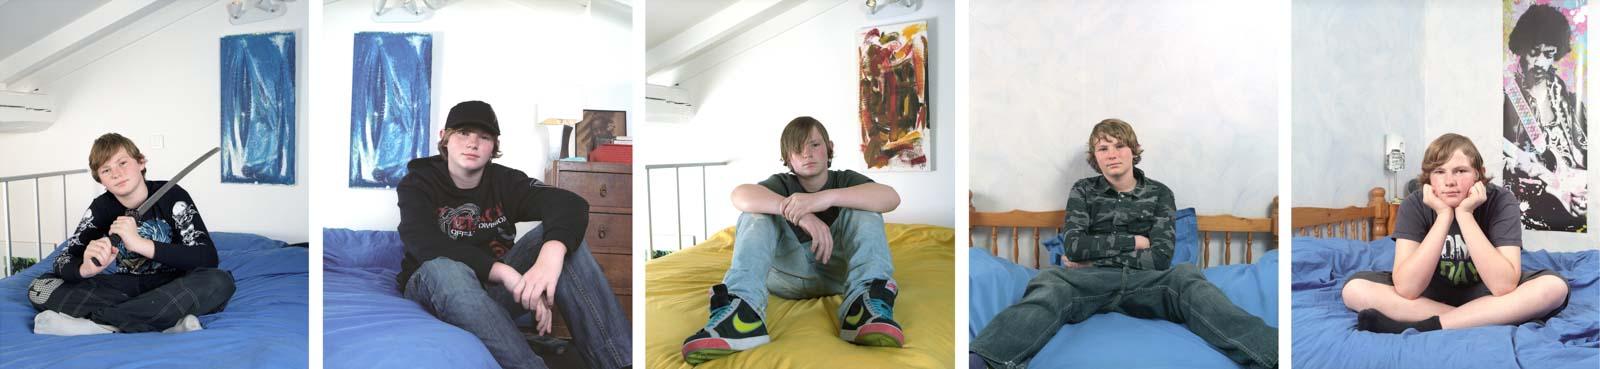 adolescents-2